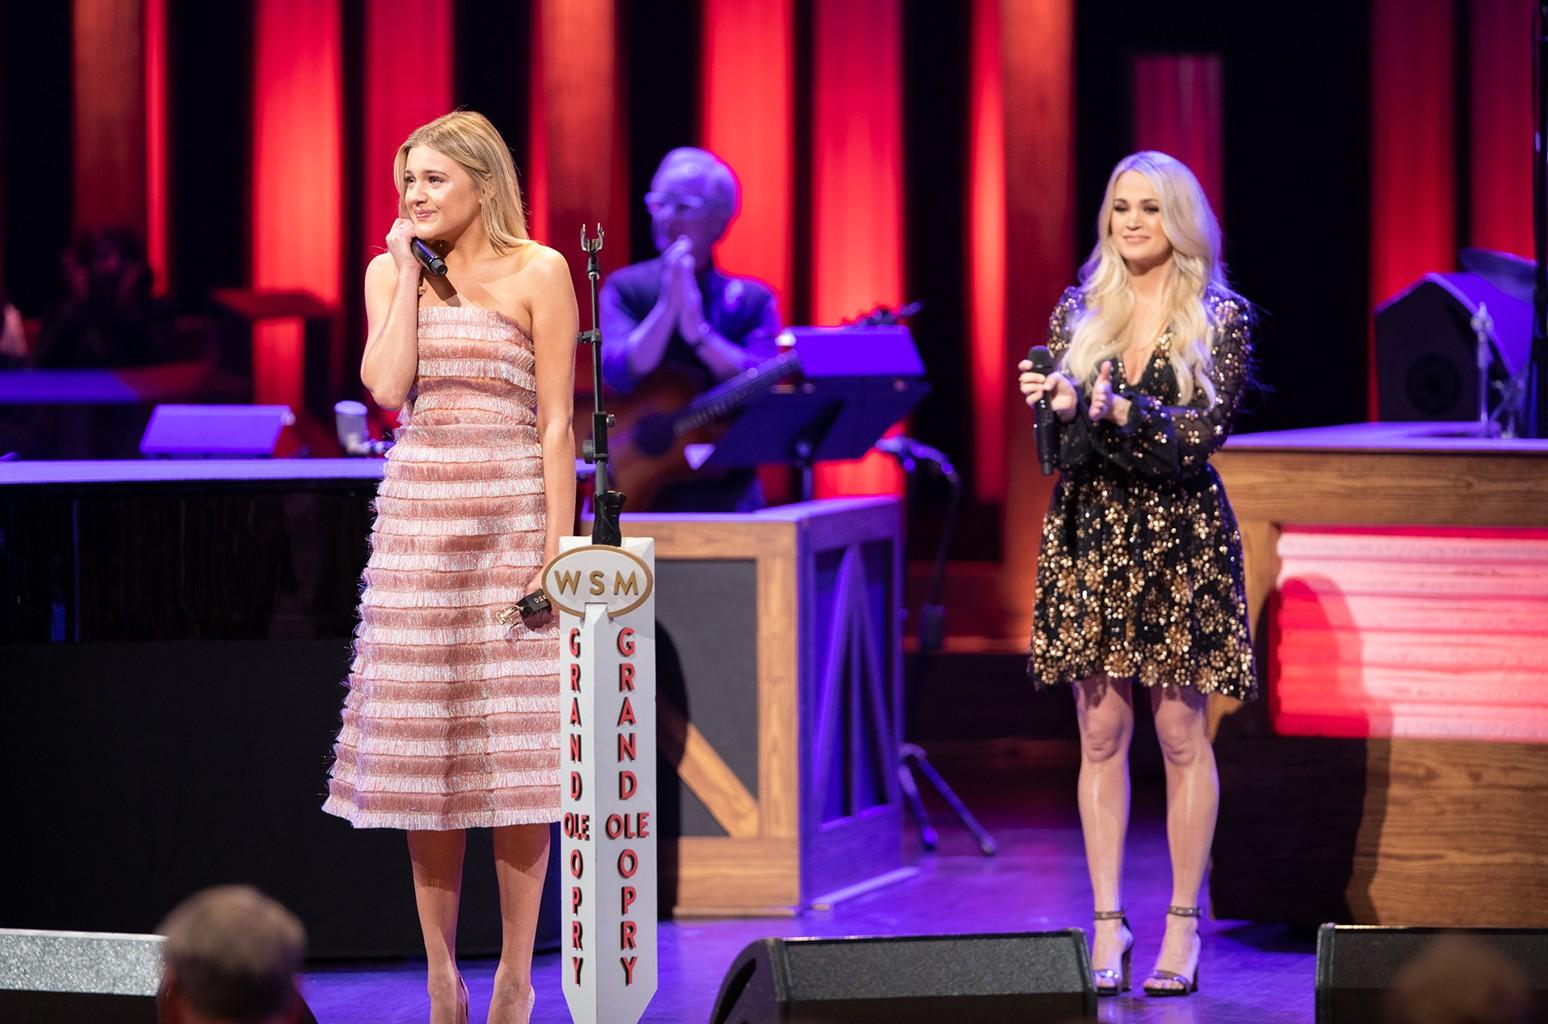 Kelsea Ballerini and Carrie Underwood